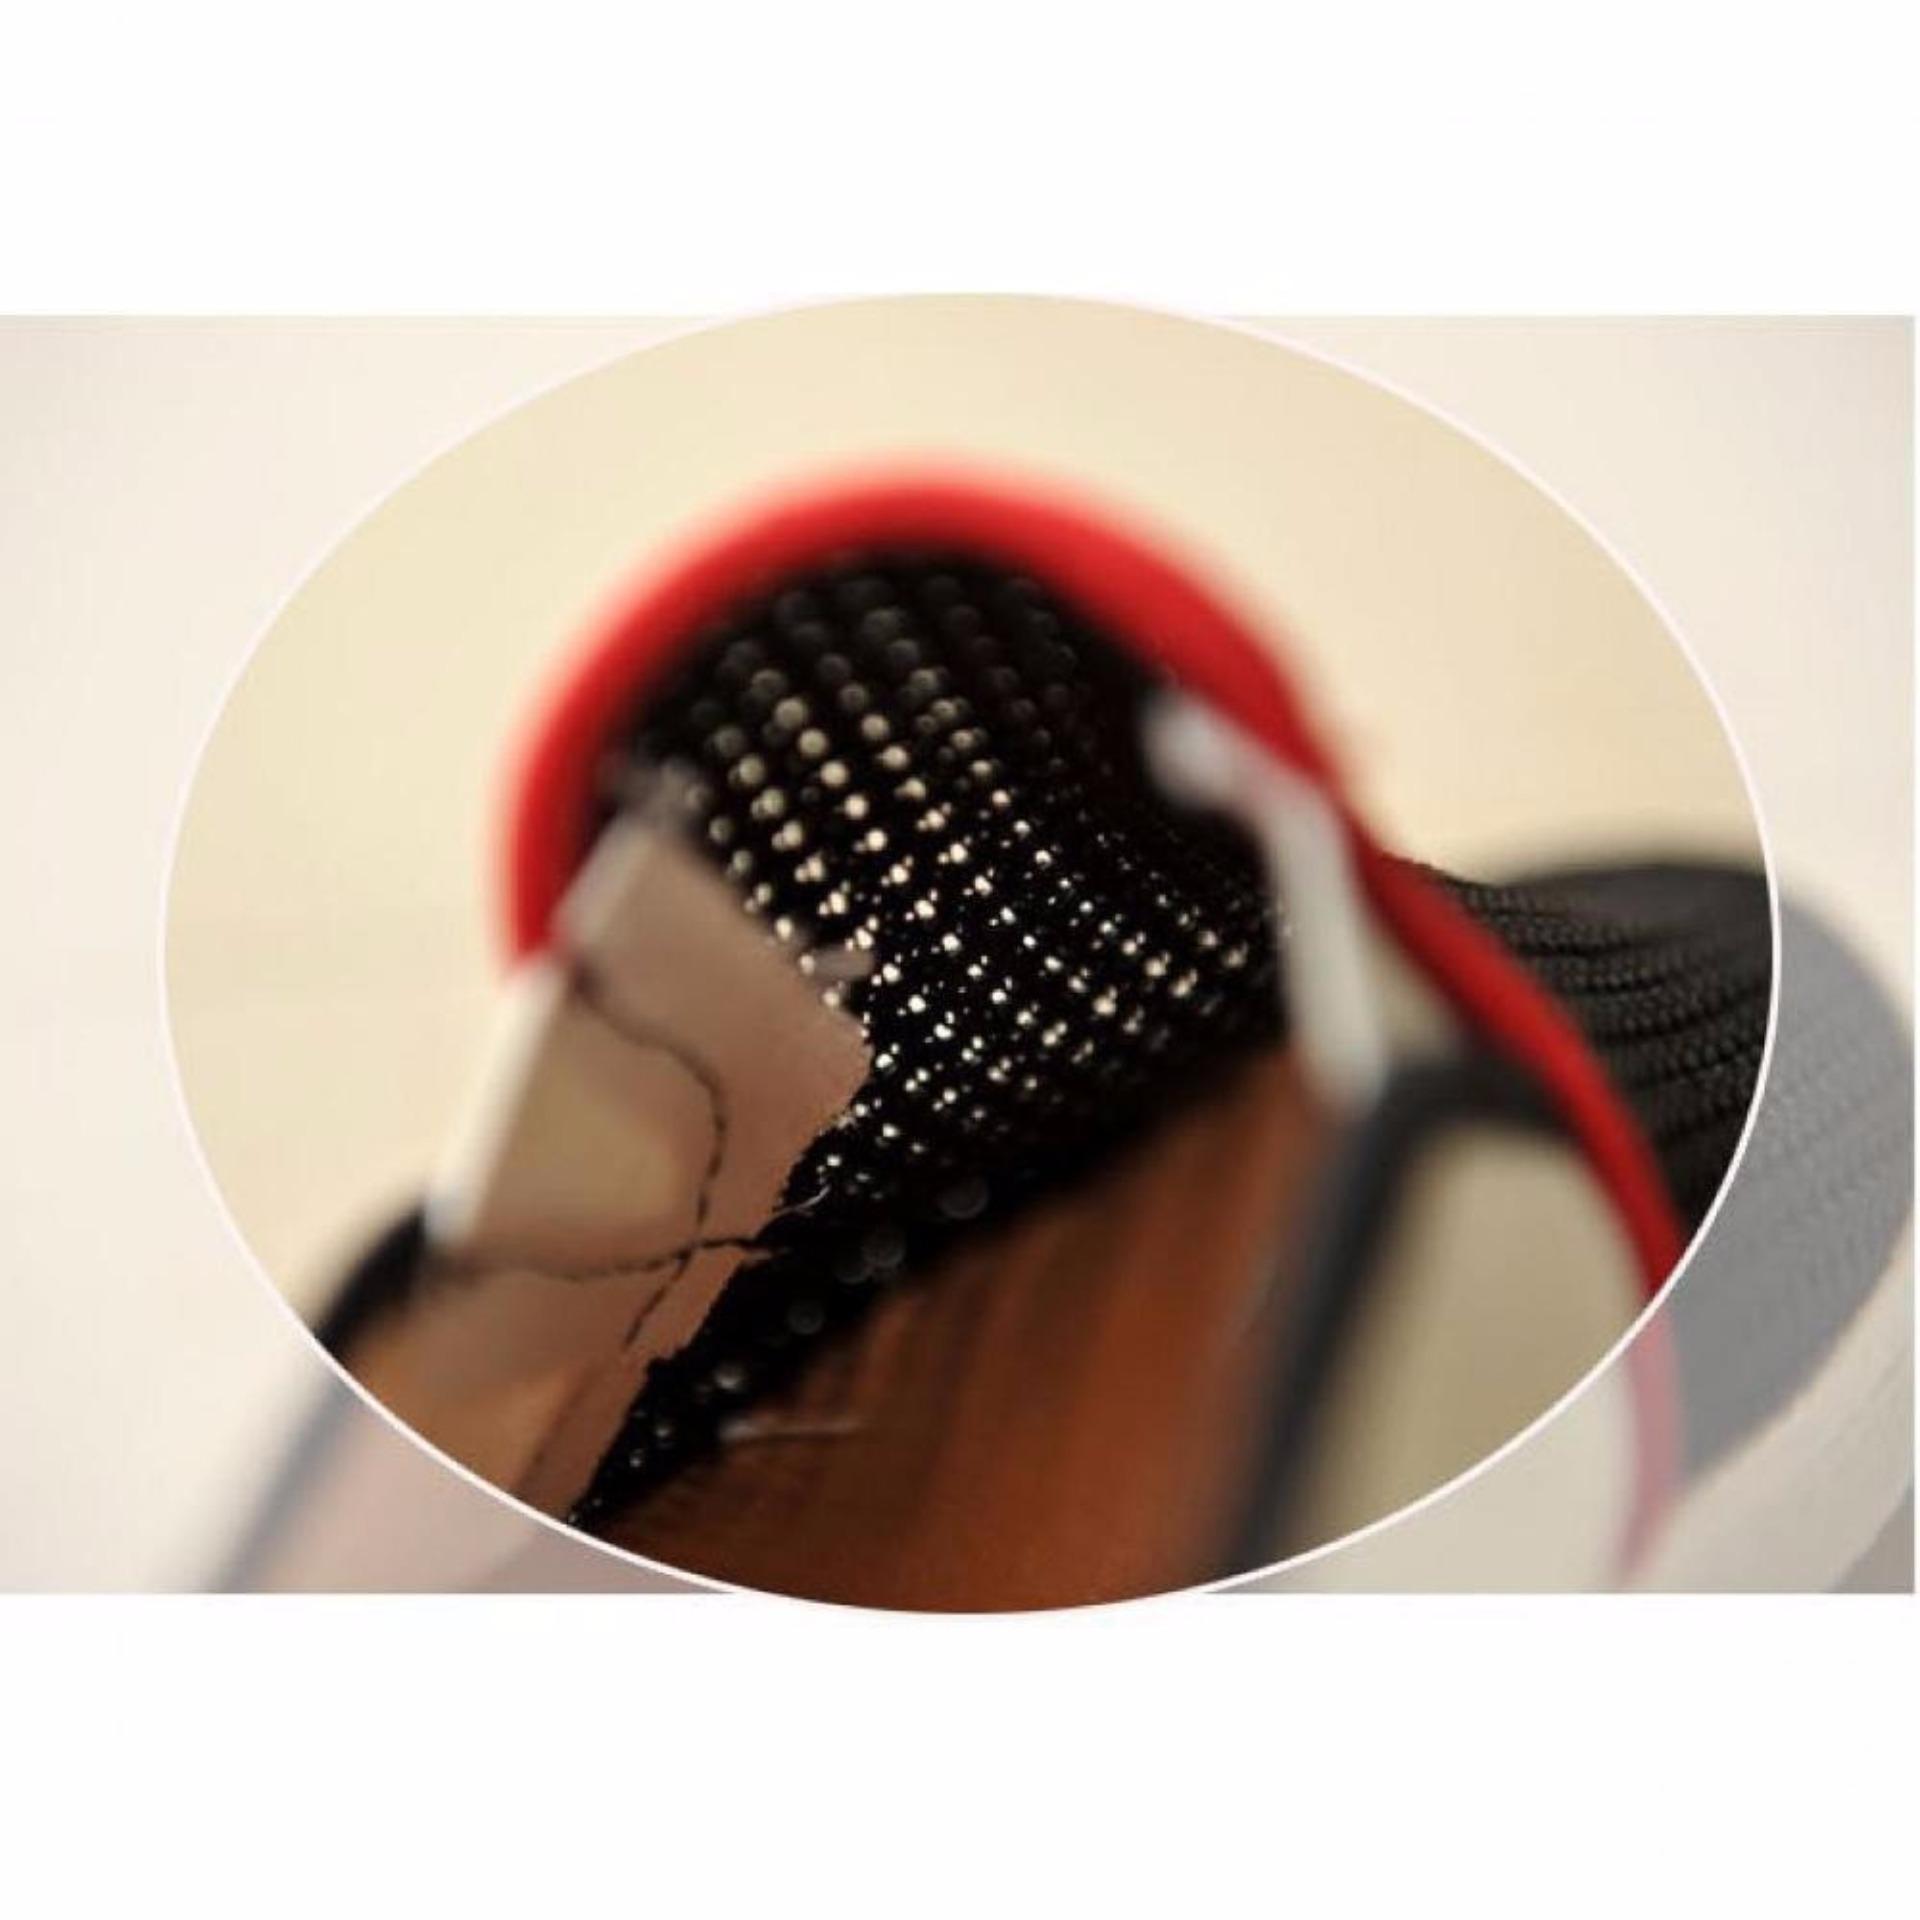 ... Sendal Sepatu Slip On Breathable Casual Mens - Sandal Pria ...